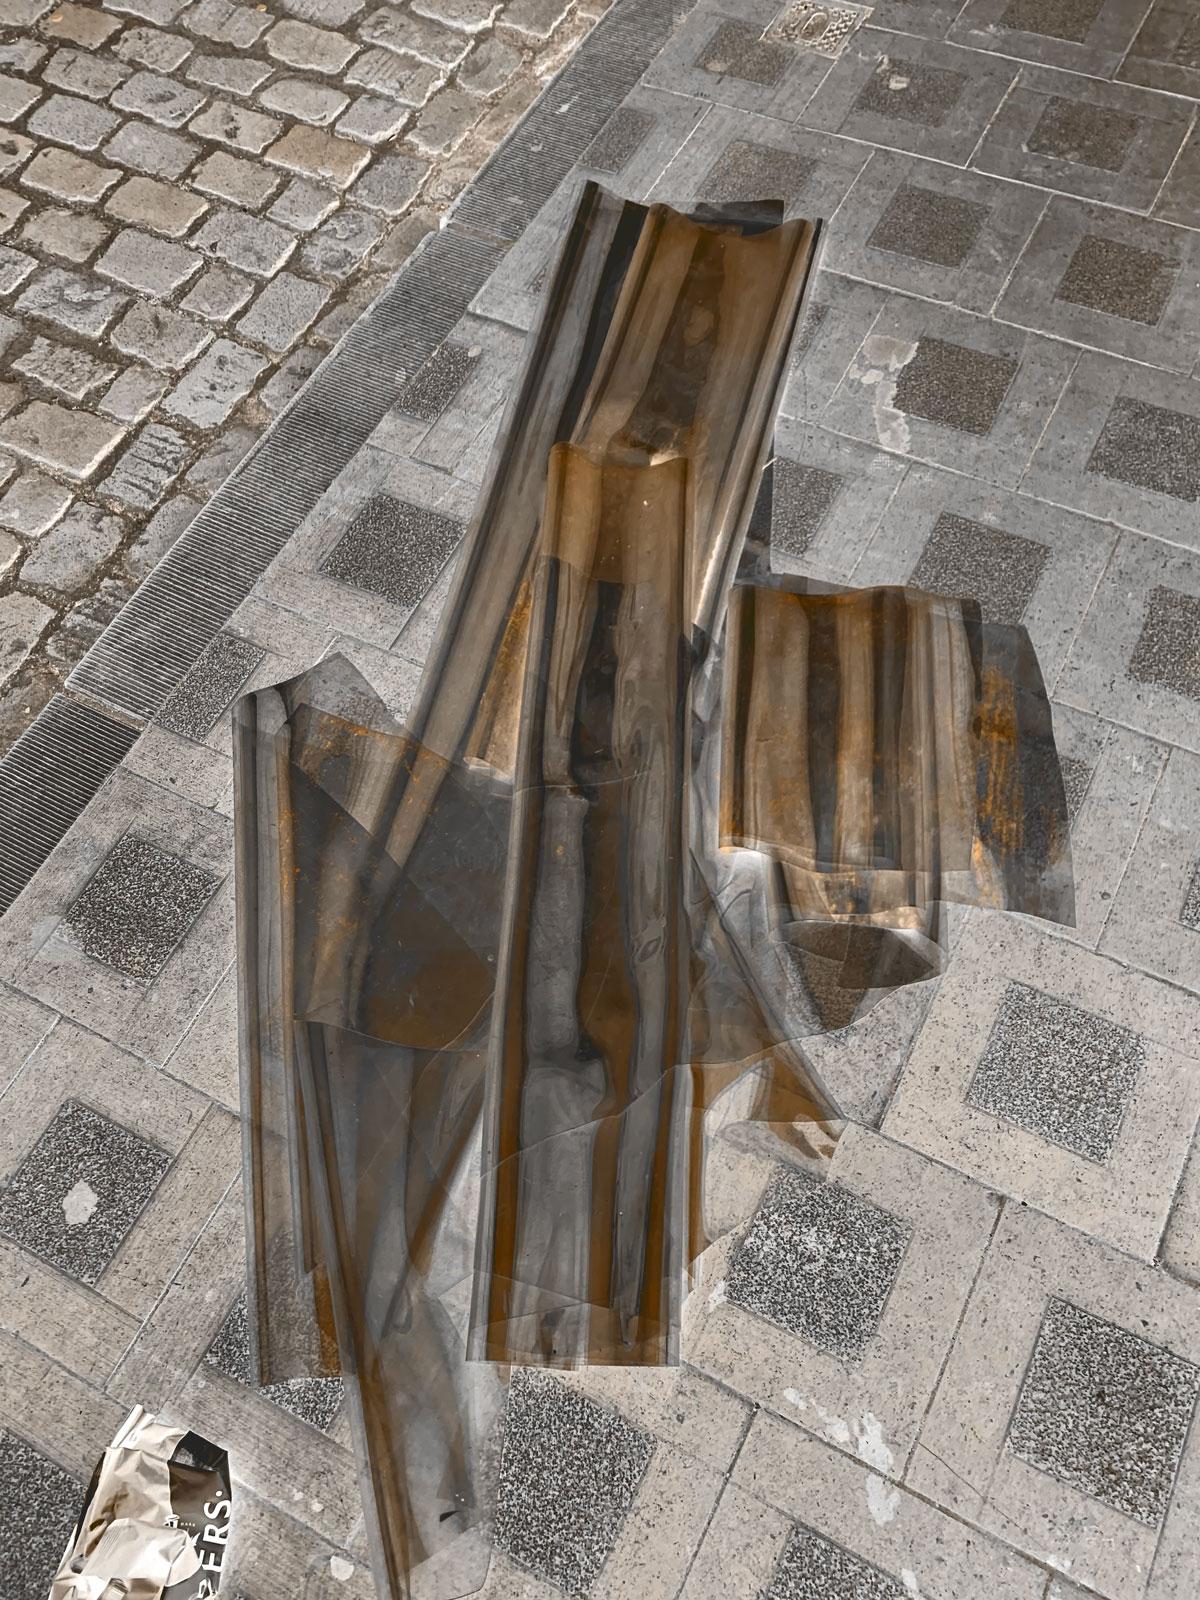 Lost & Found - Pimped Garbage 04 • 52.5 x 70 cm (20.67 x 27.56 in)